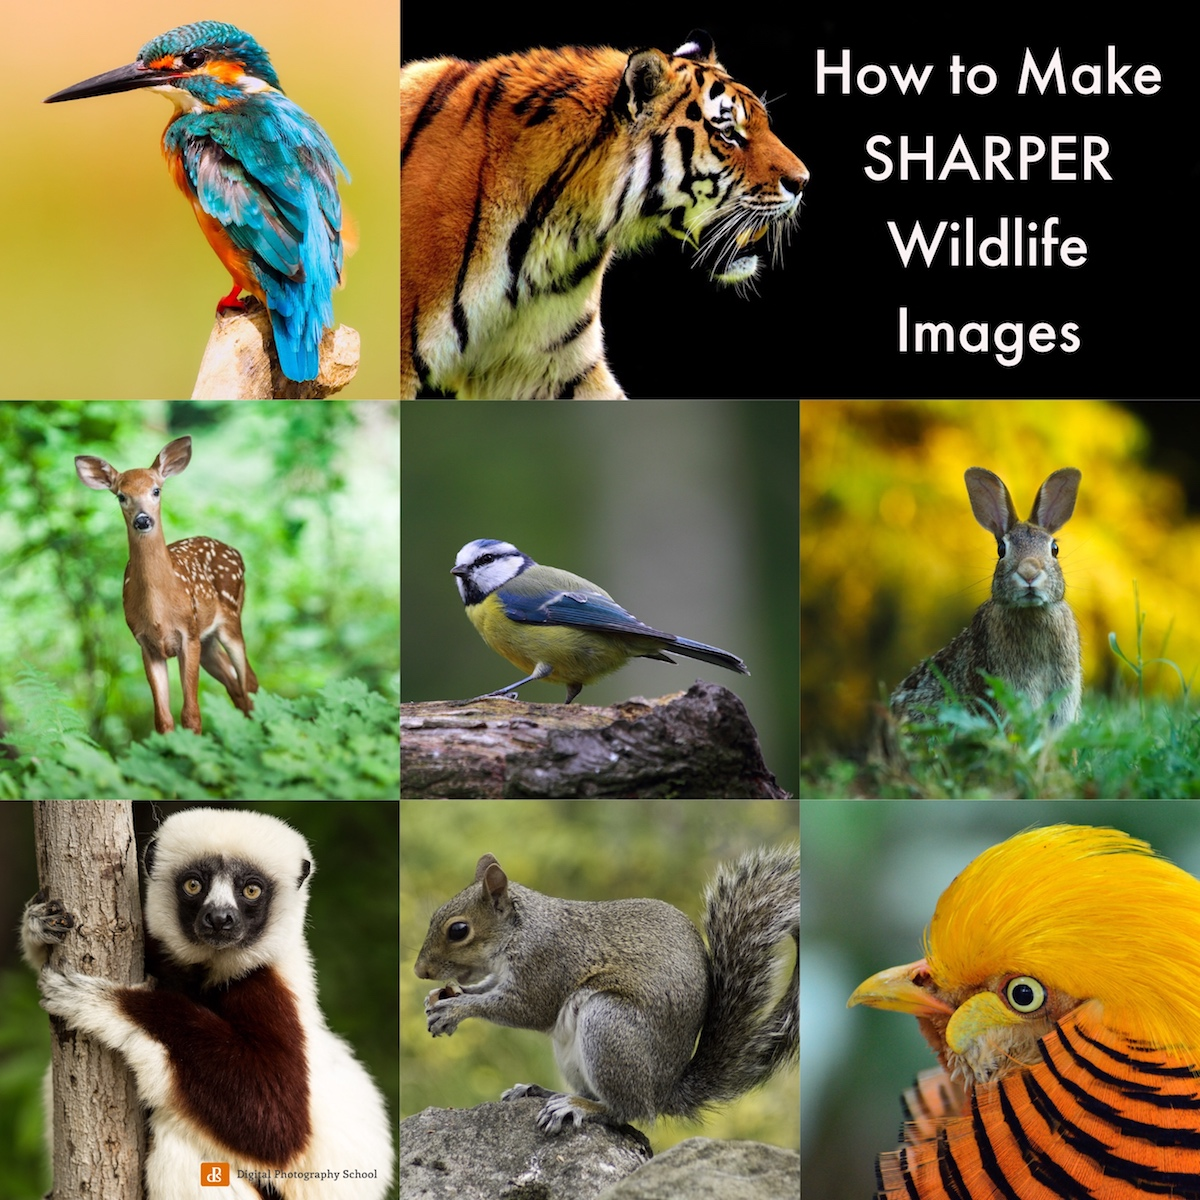 Making Sharper Wildlife Photographs - [Part 1 of 2]